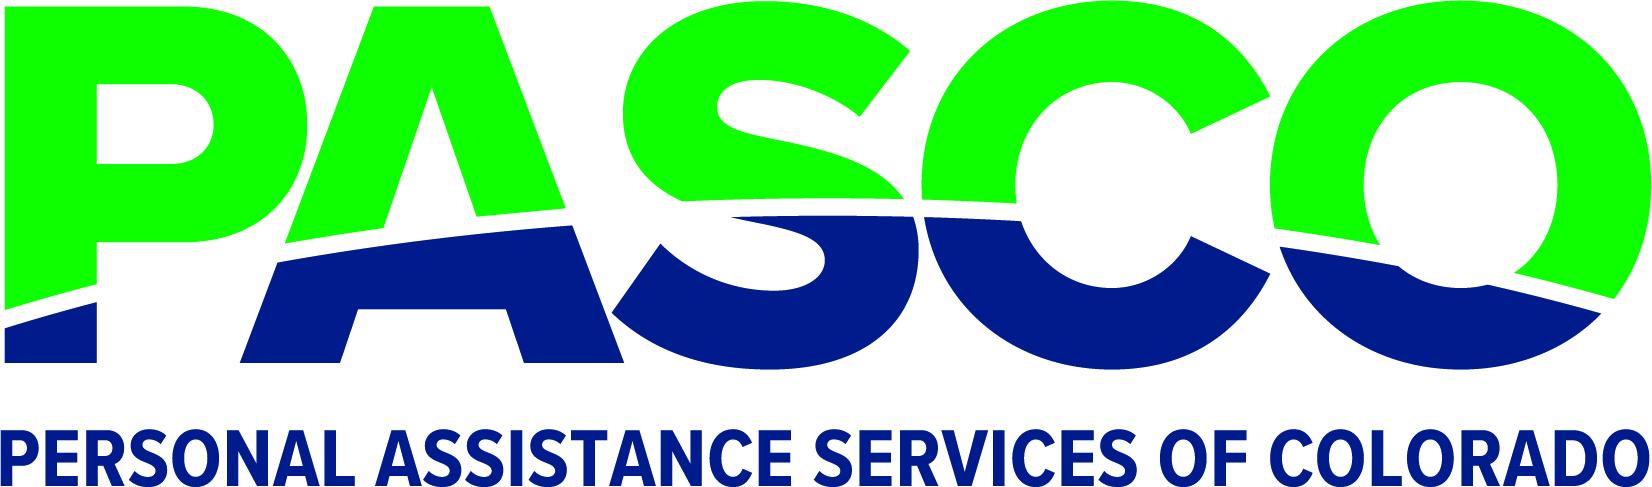 PASCO_logo_wType[3858].jpg